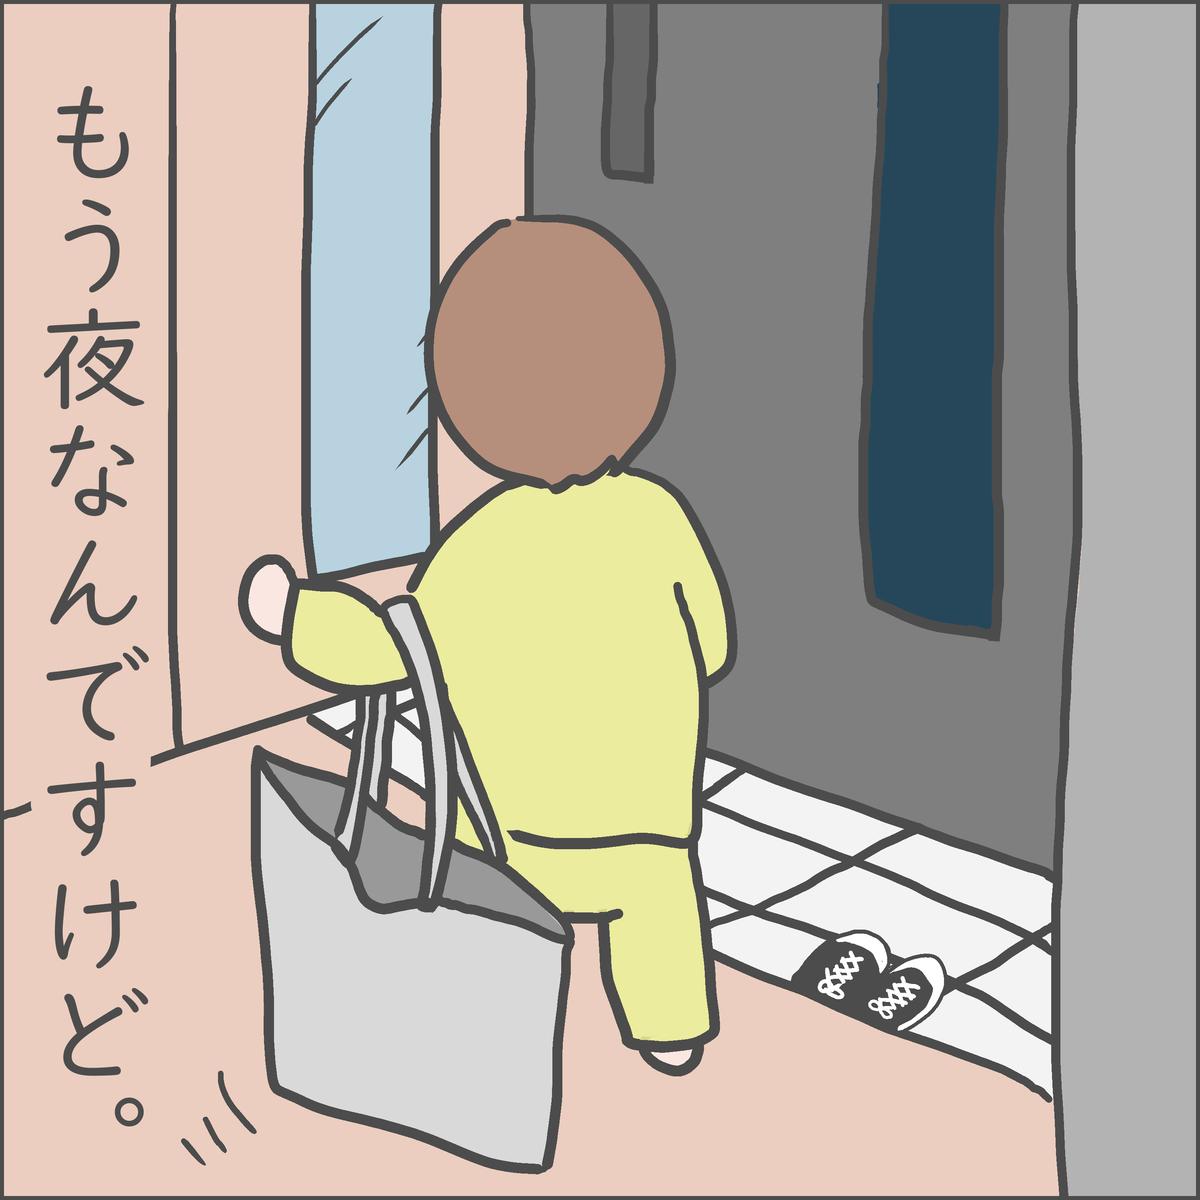 f:id:ika_yoshi:20201122234142j:plain